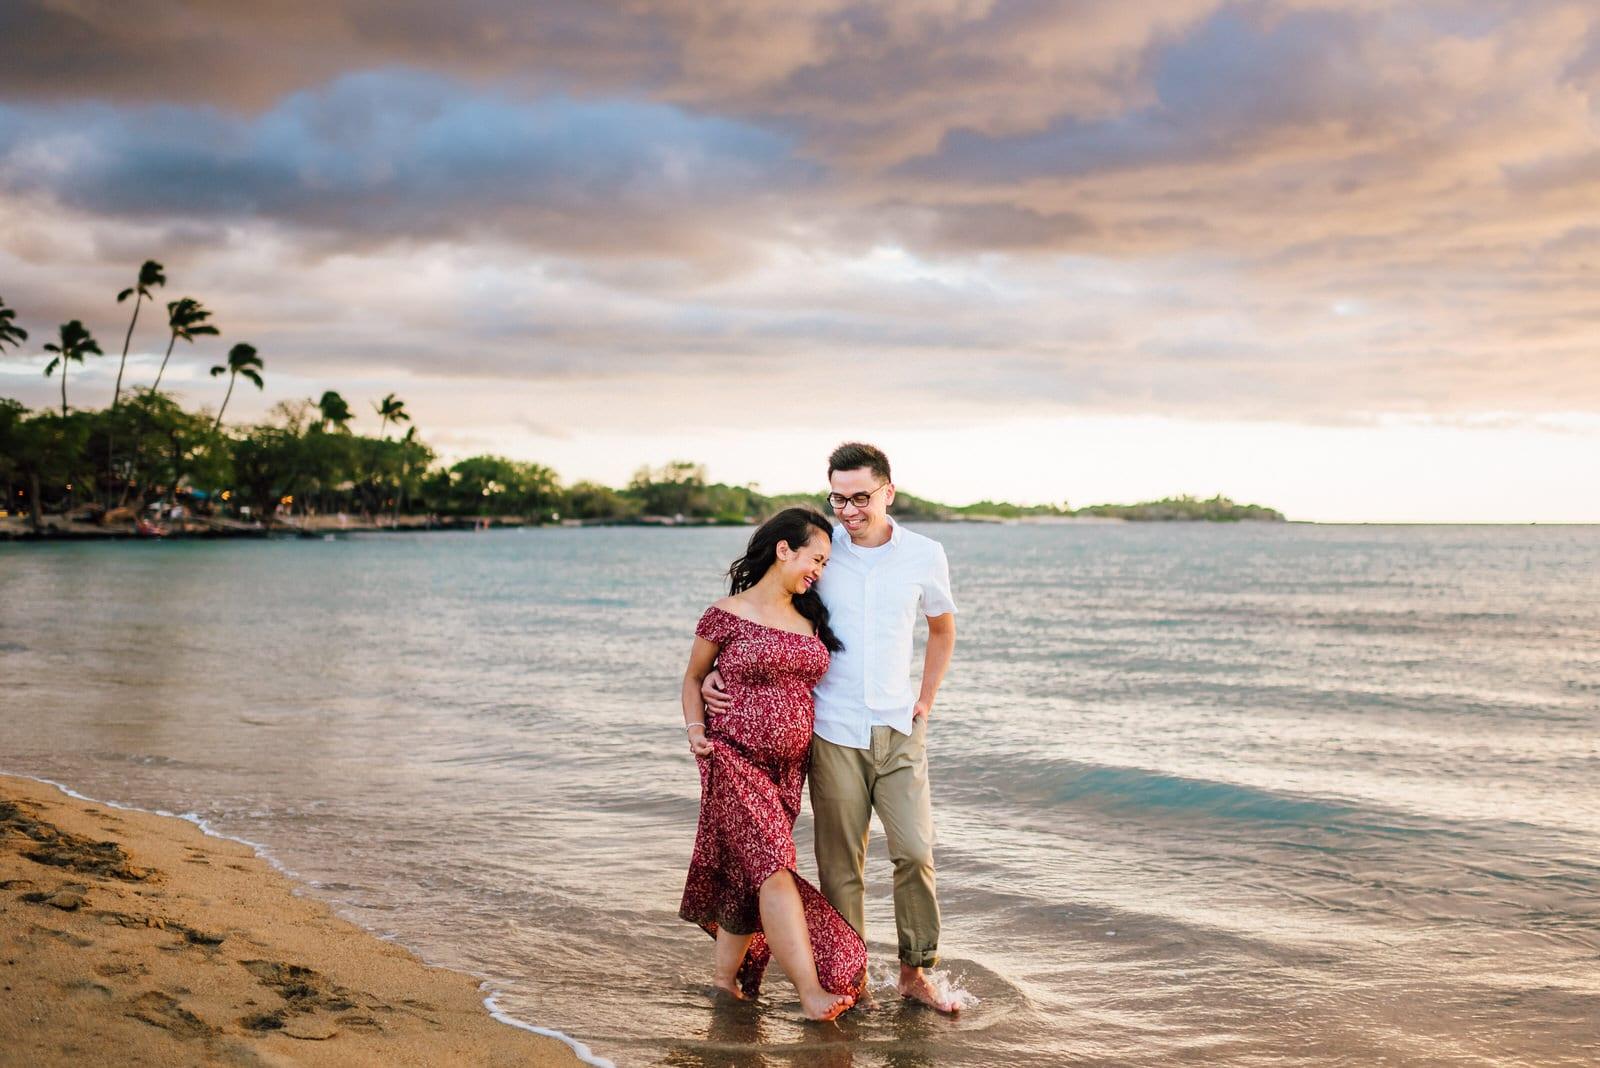 hawaii-babymoon-sunset-photographer-11.jpg